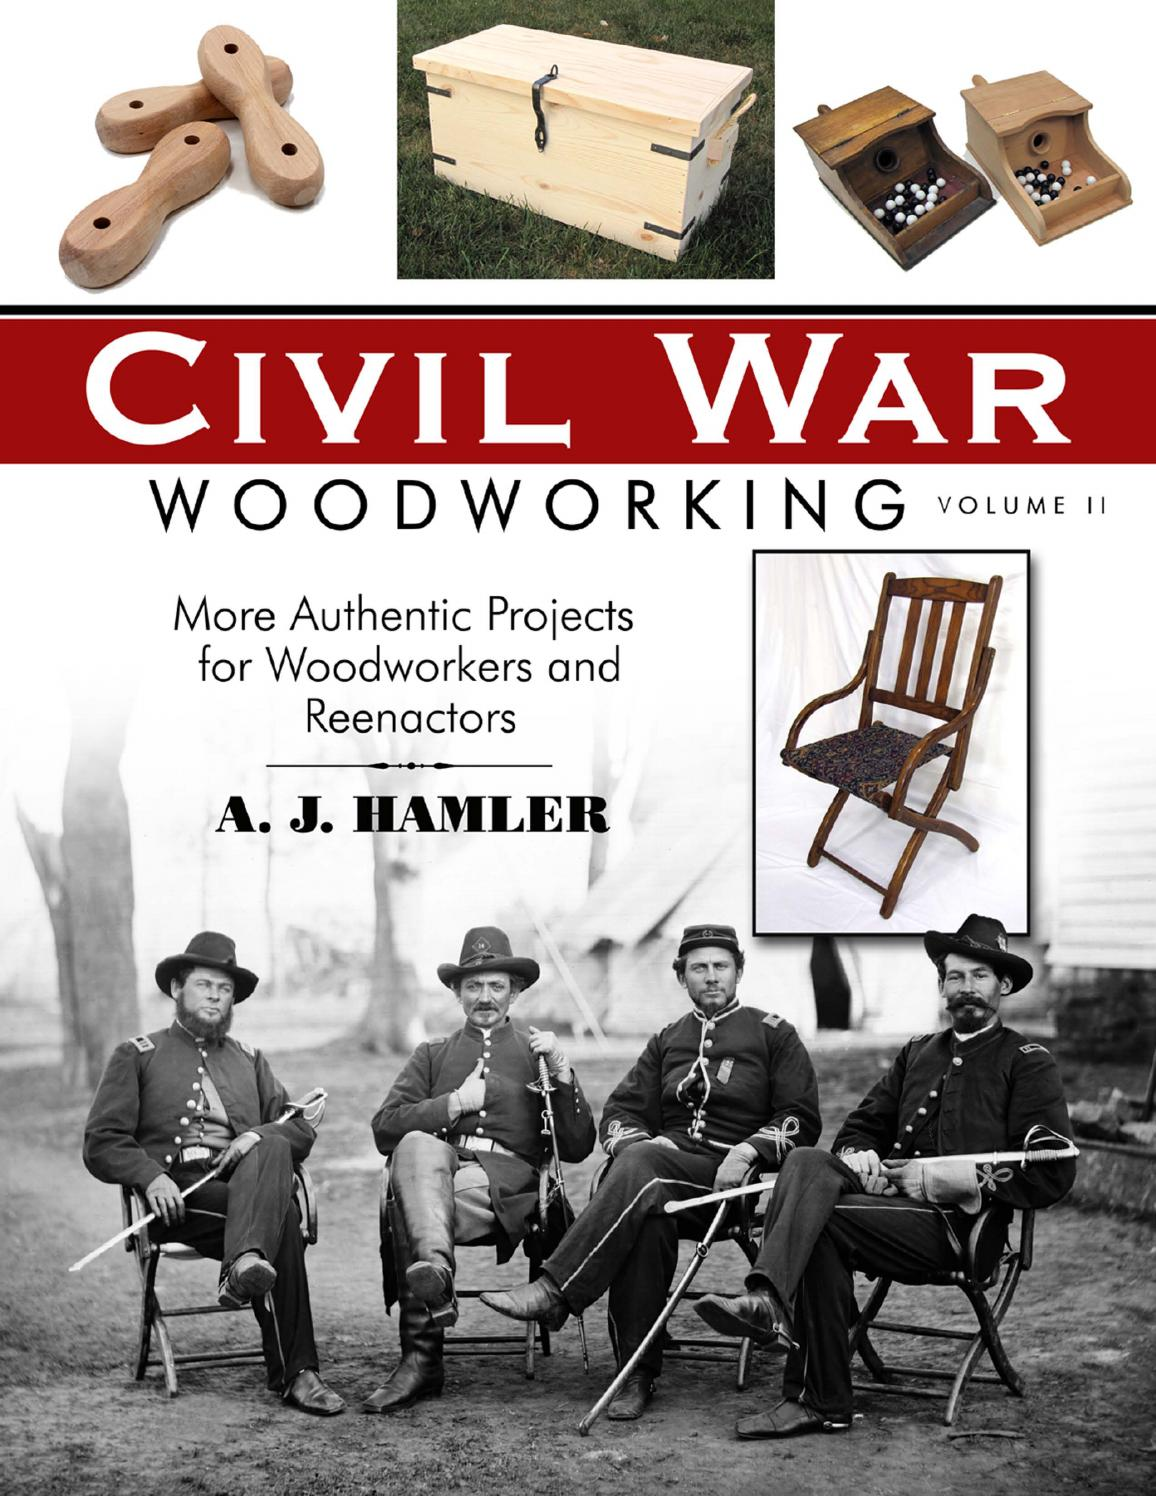 Civil War Woodworking, Vol. II by Kent Sorsky - issuu